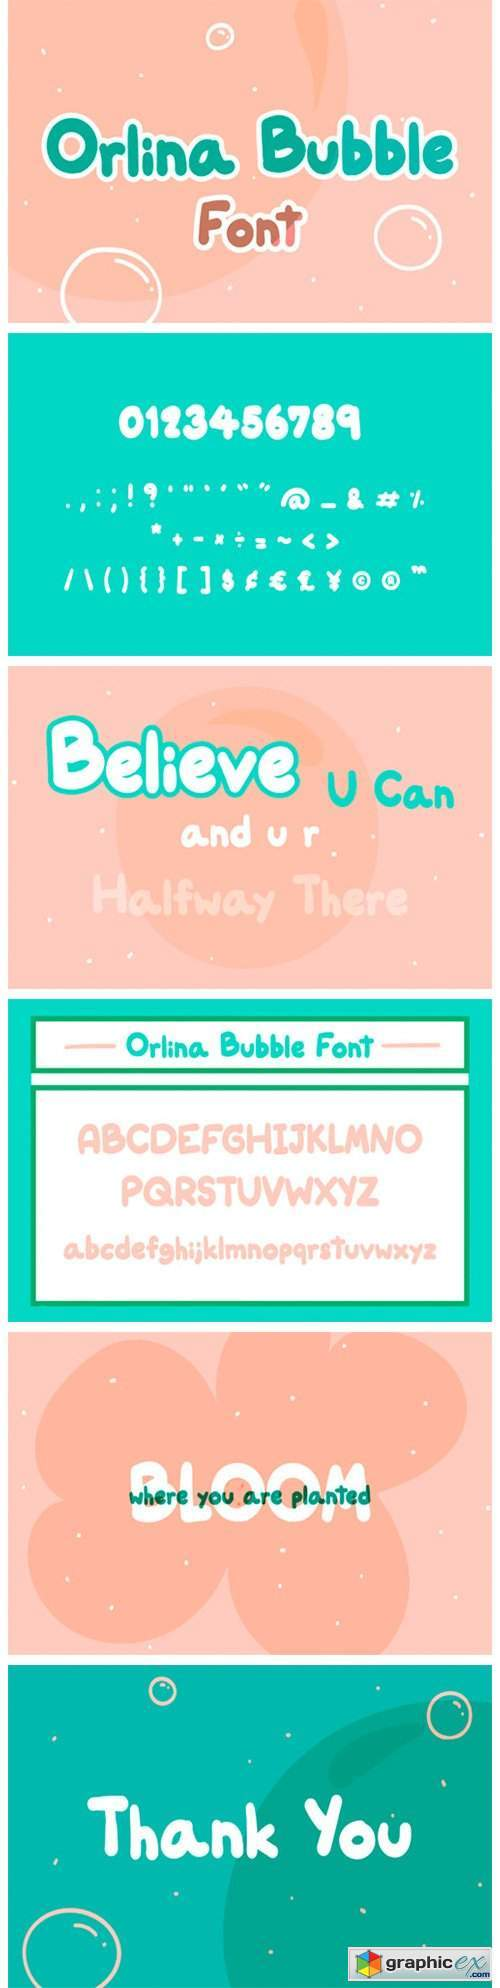 Orlina Bubble Font